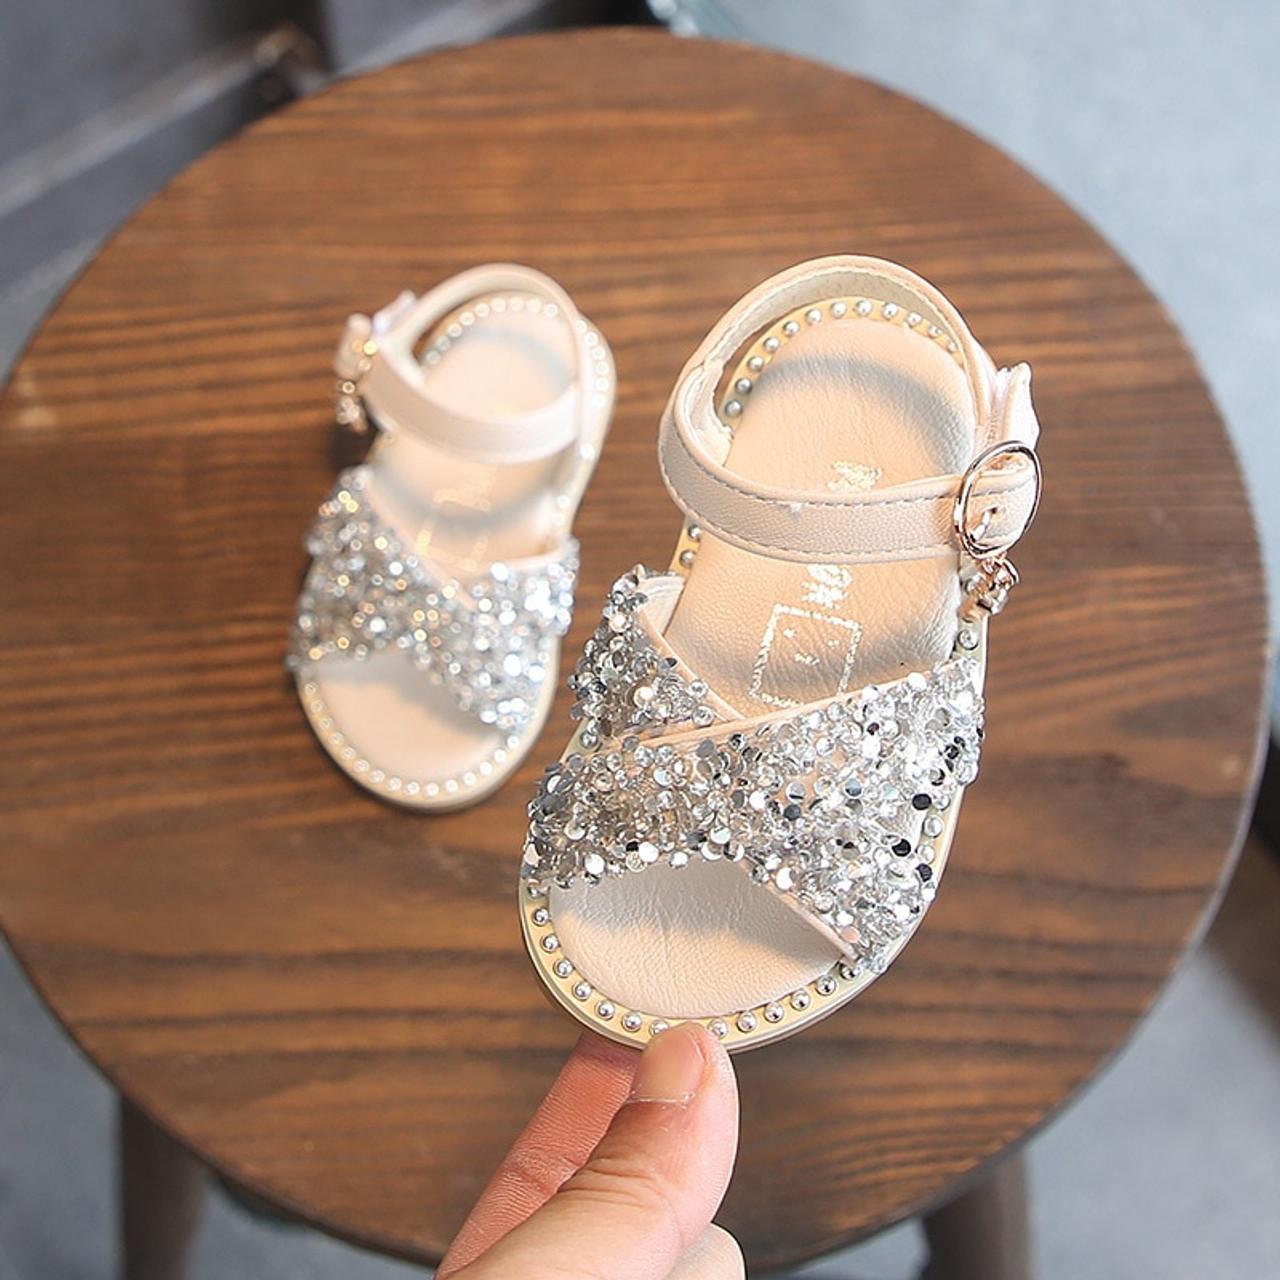 f1162d3a1846 ... Claladoudou 11.5-15.5CM Baby Bling Shoes Pu Leather Infant Beige Rivets  Summer Sandals Kid ...